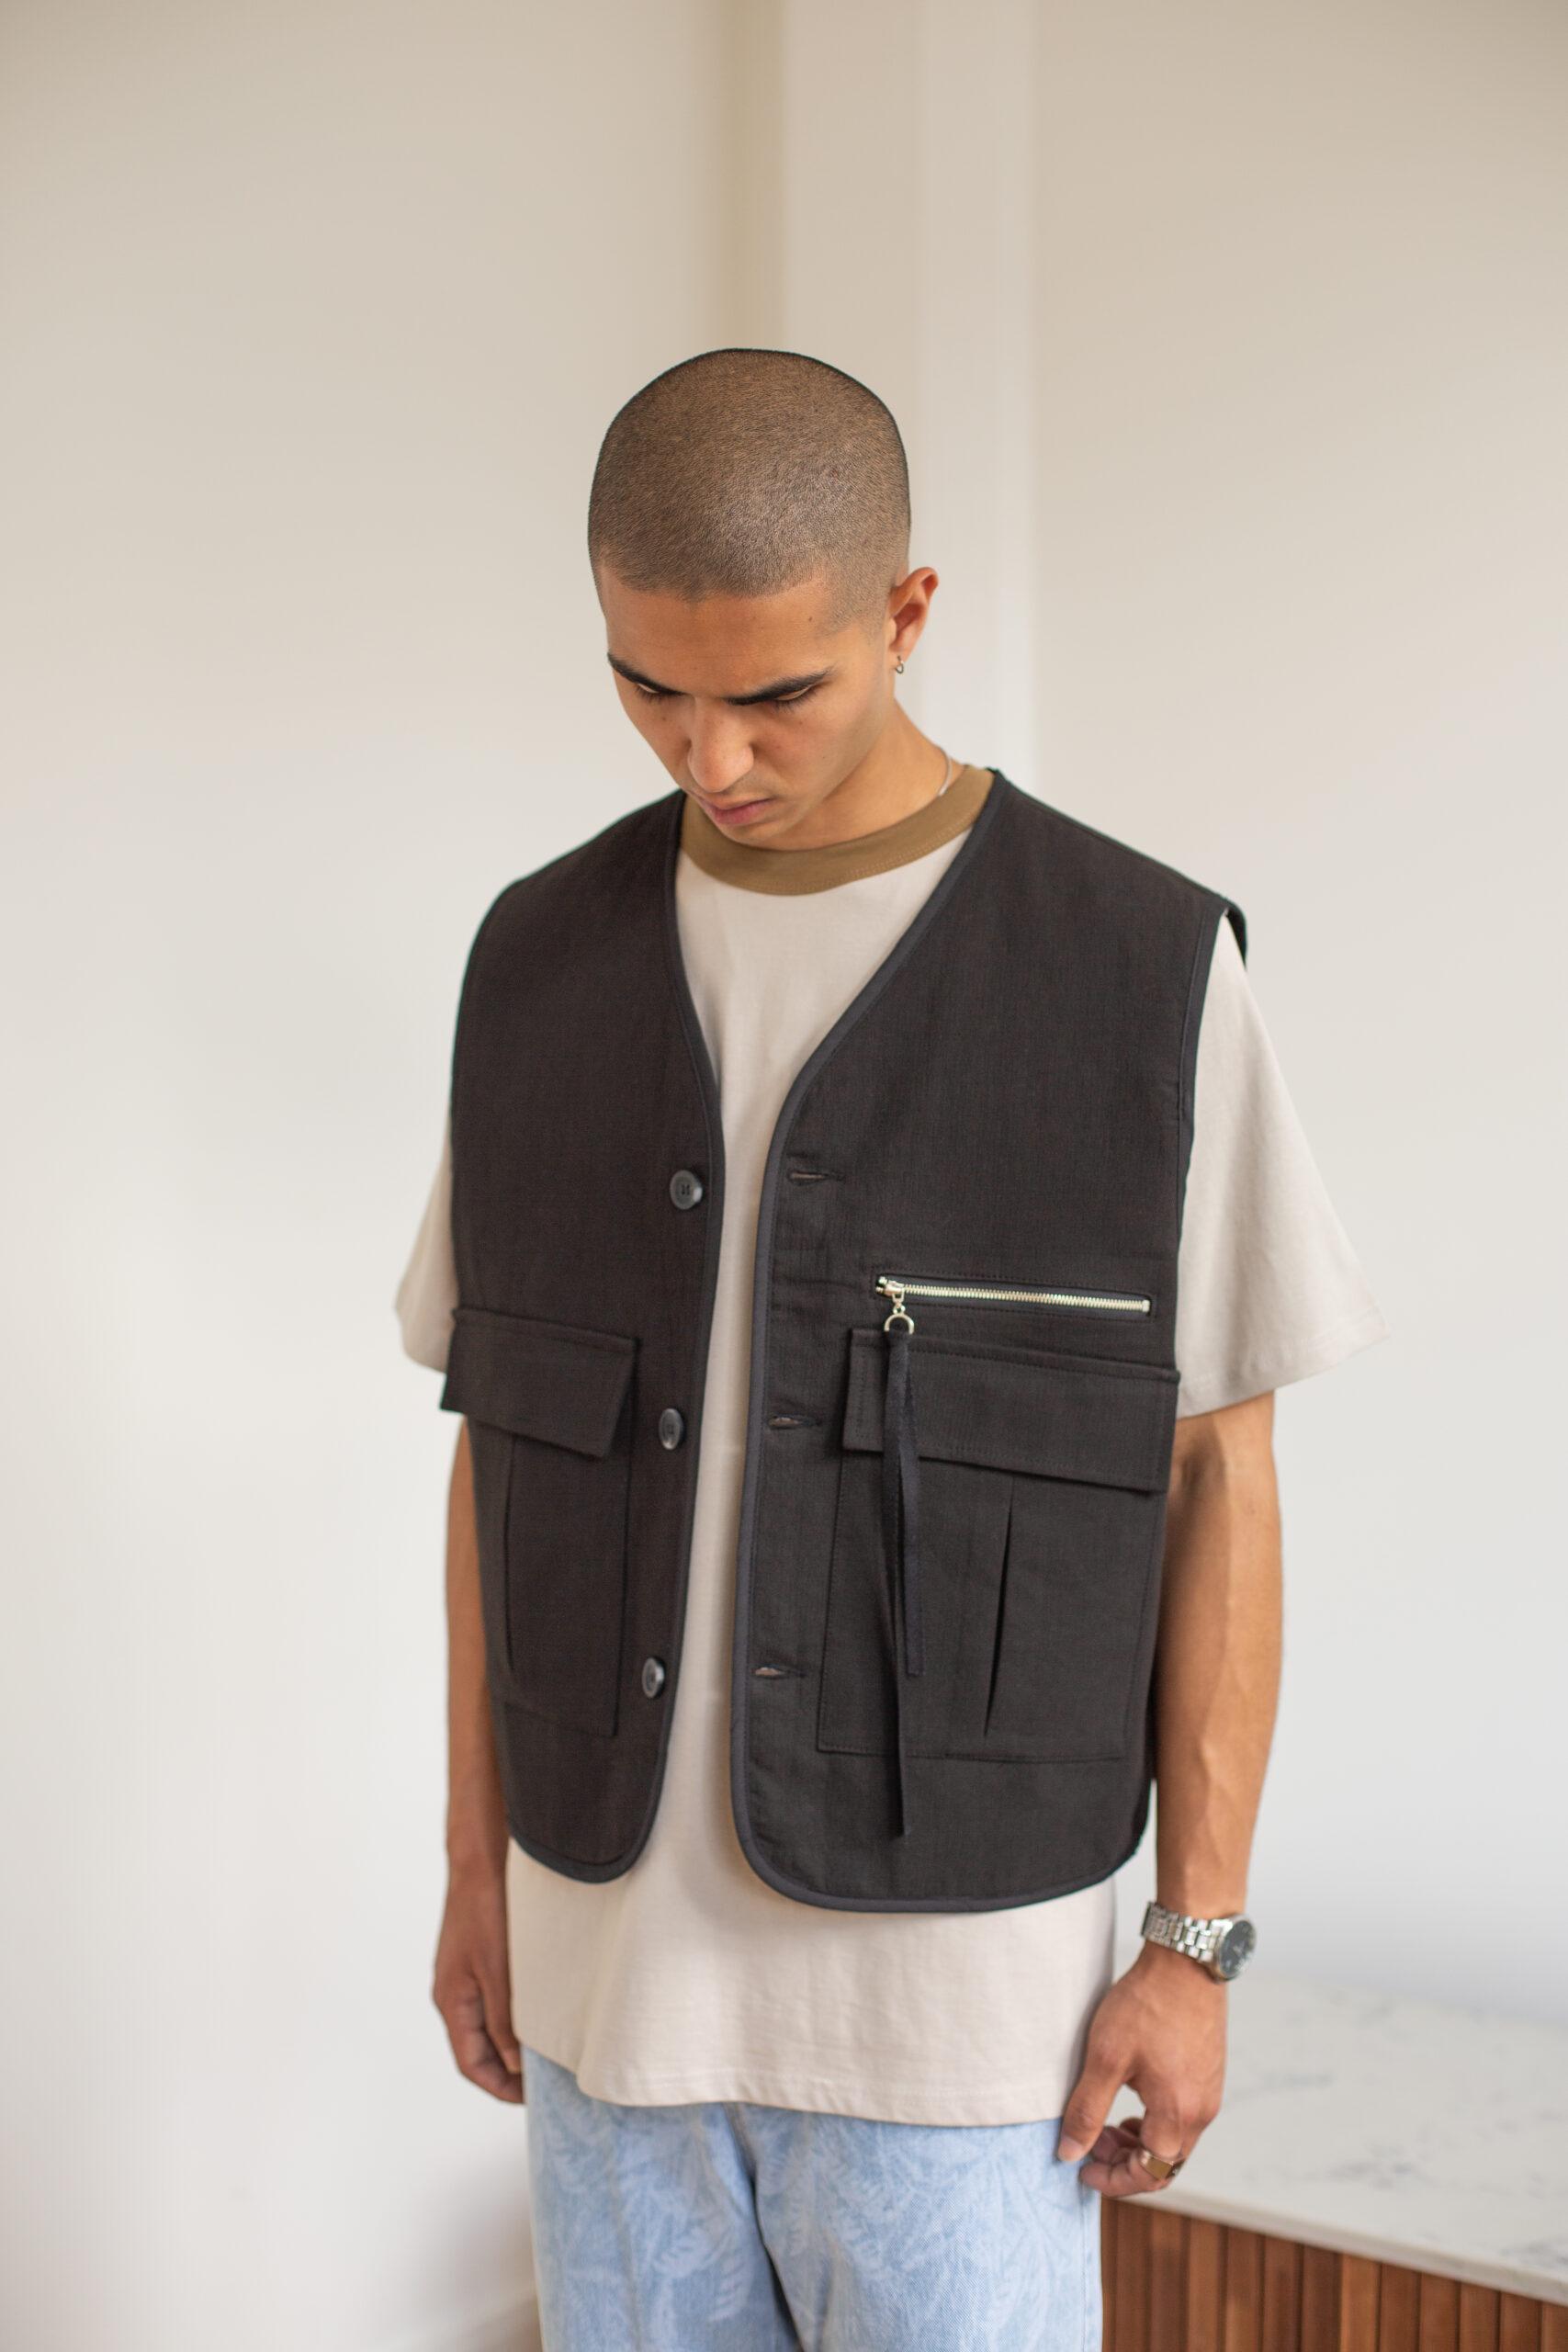 Welldone Pocket Vest by Voo Shop